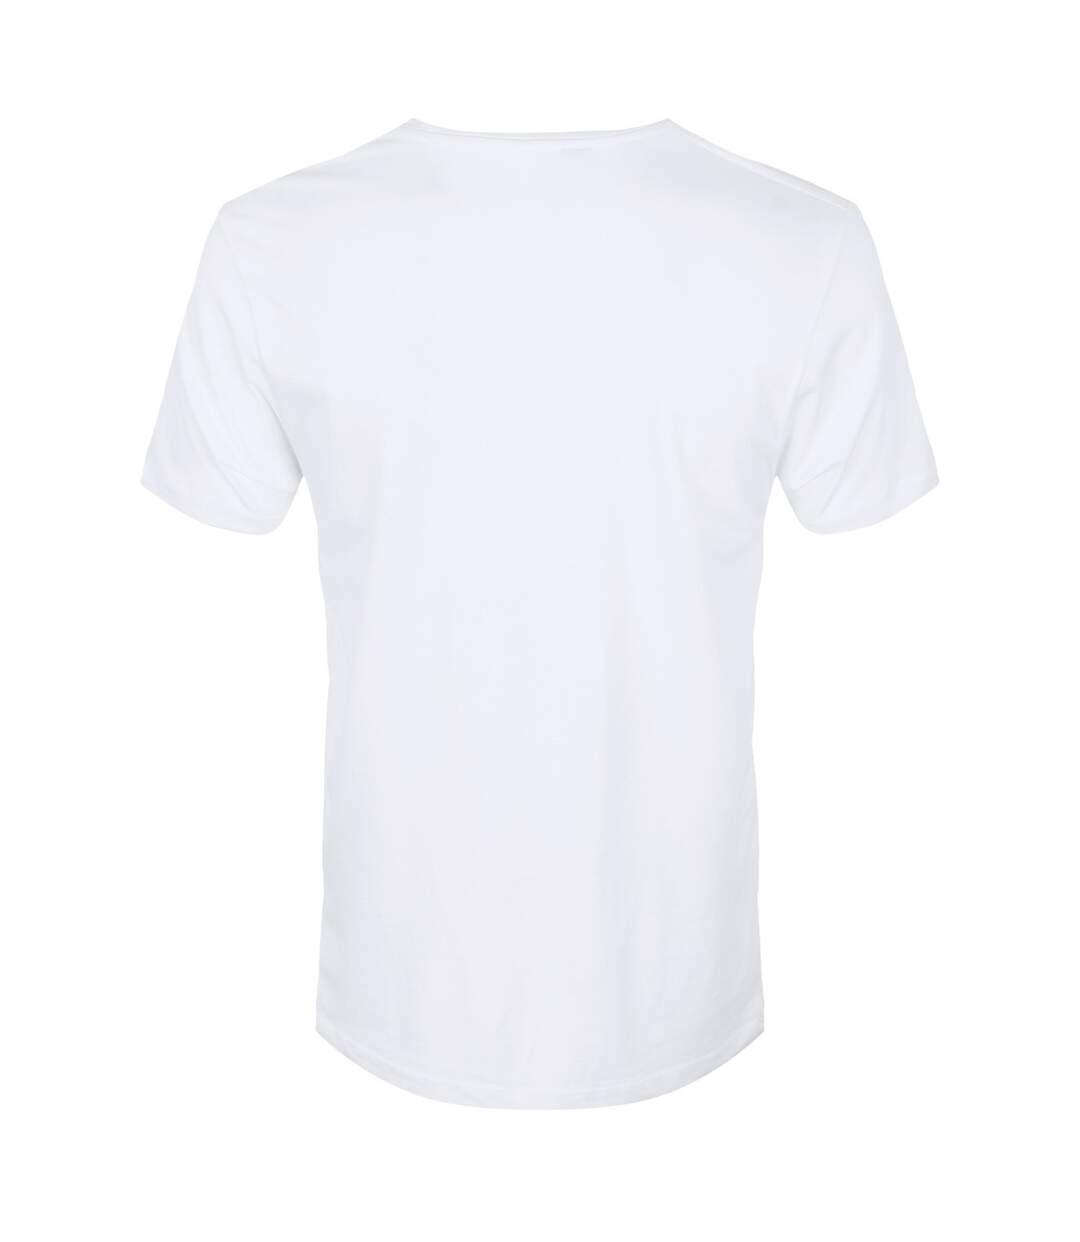 Unorthodox Collective Mens Geometric Python T-Shirt (White) - UTGR3790